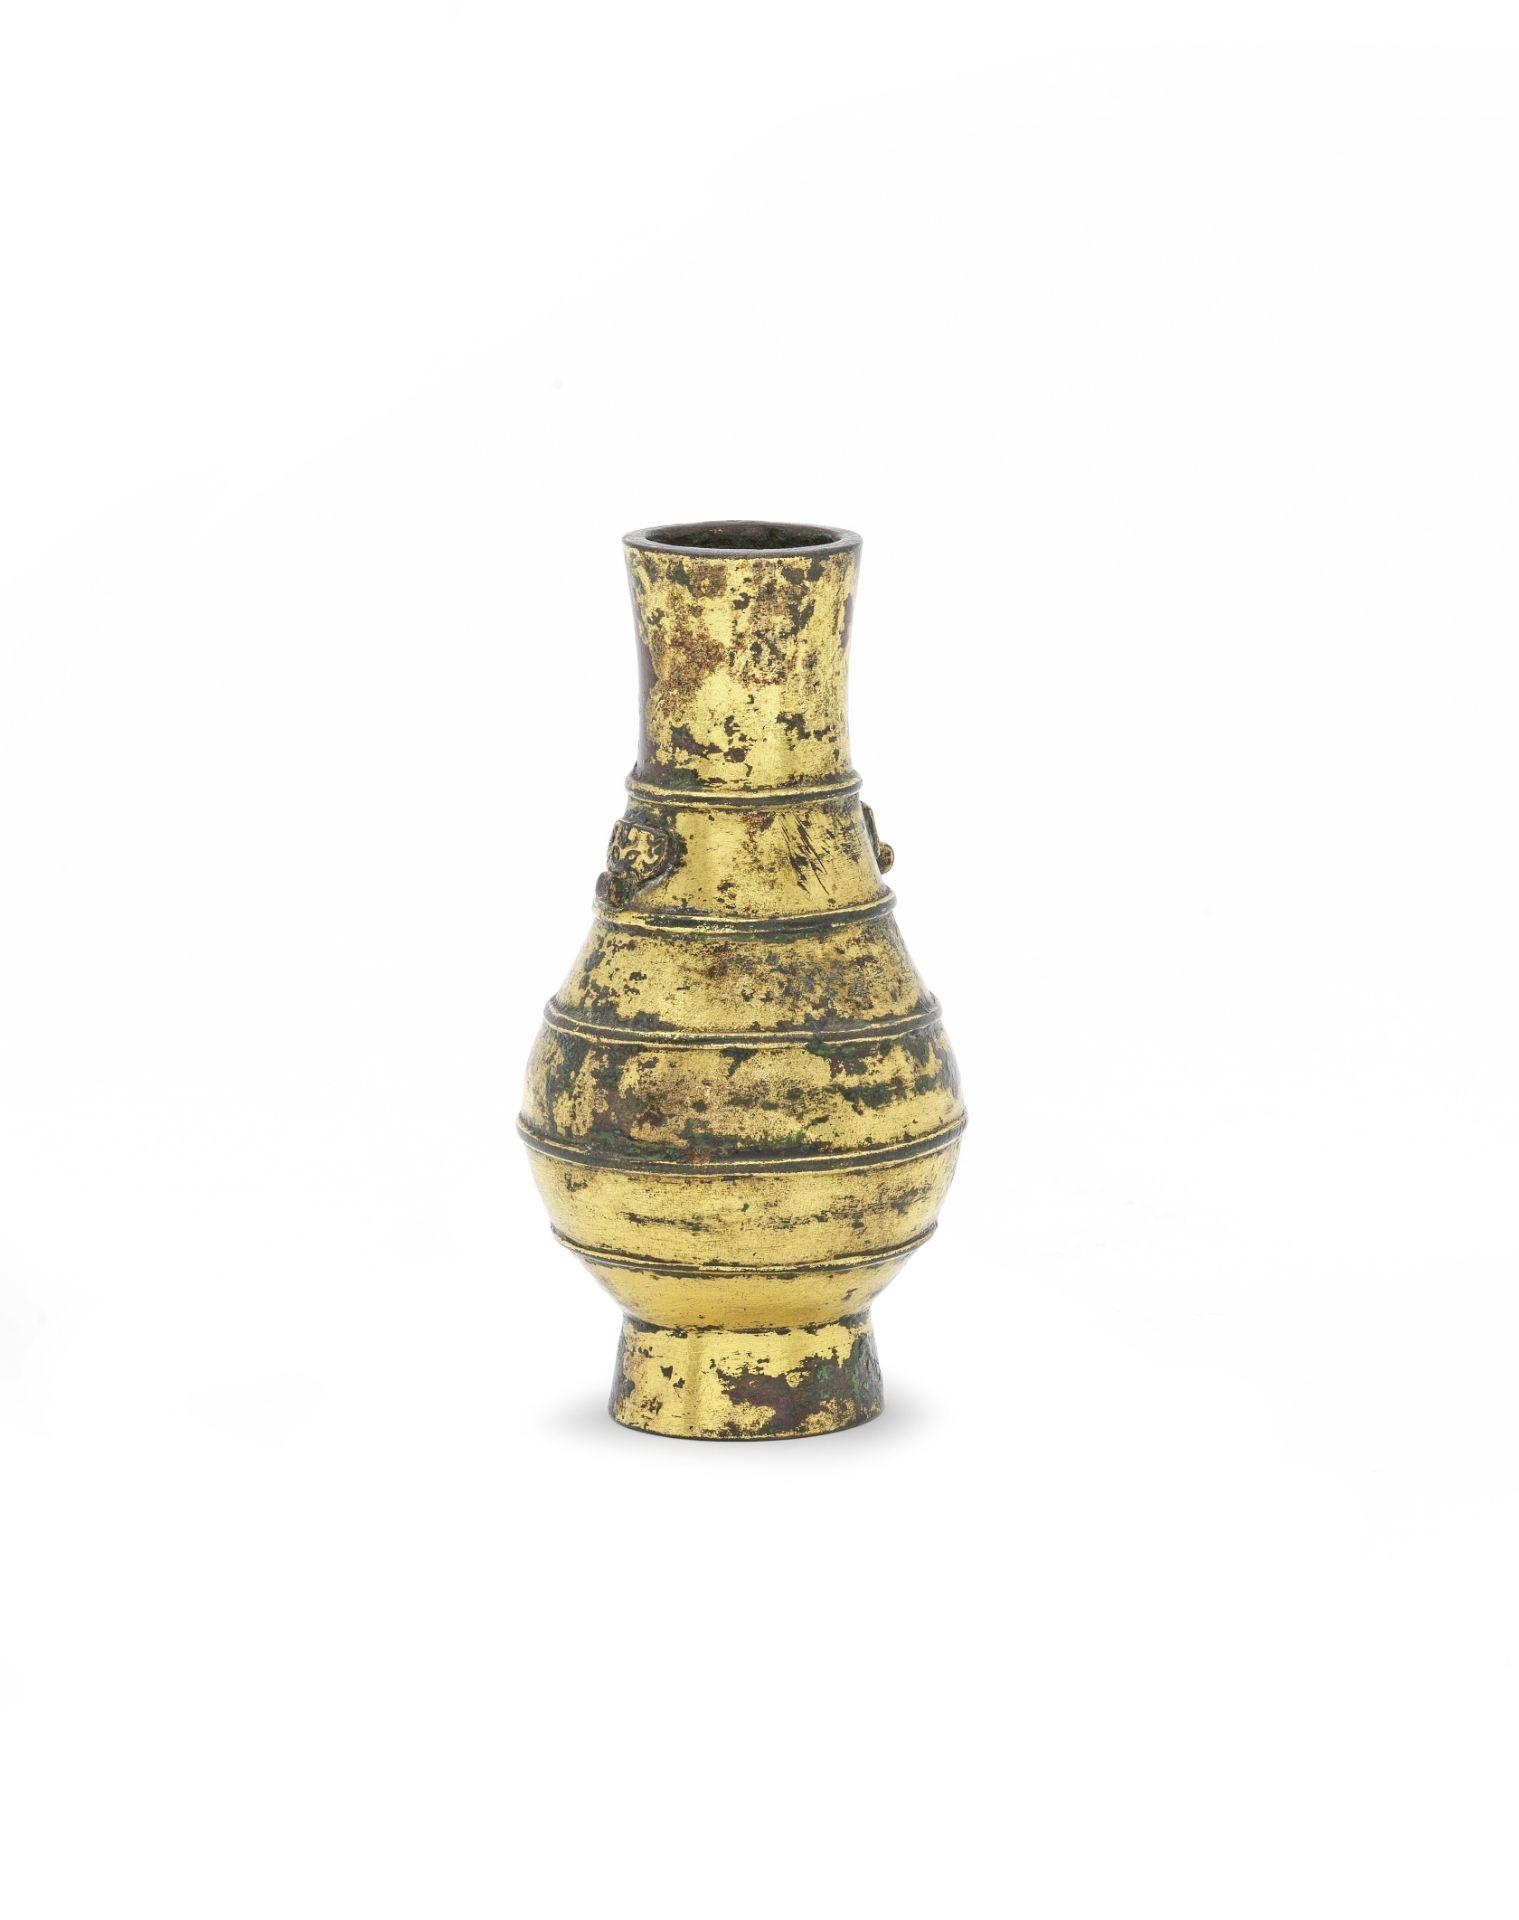 A RARE SMALL GILT-BRONZE VASE, HU Ming Dynasty or earlier